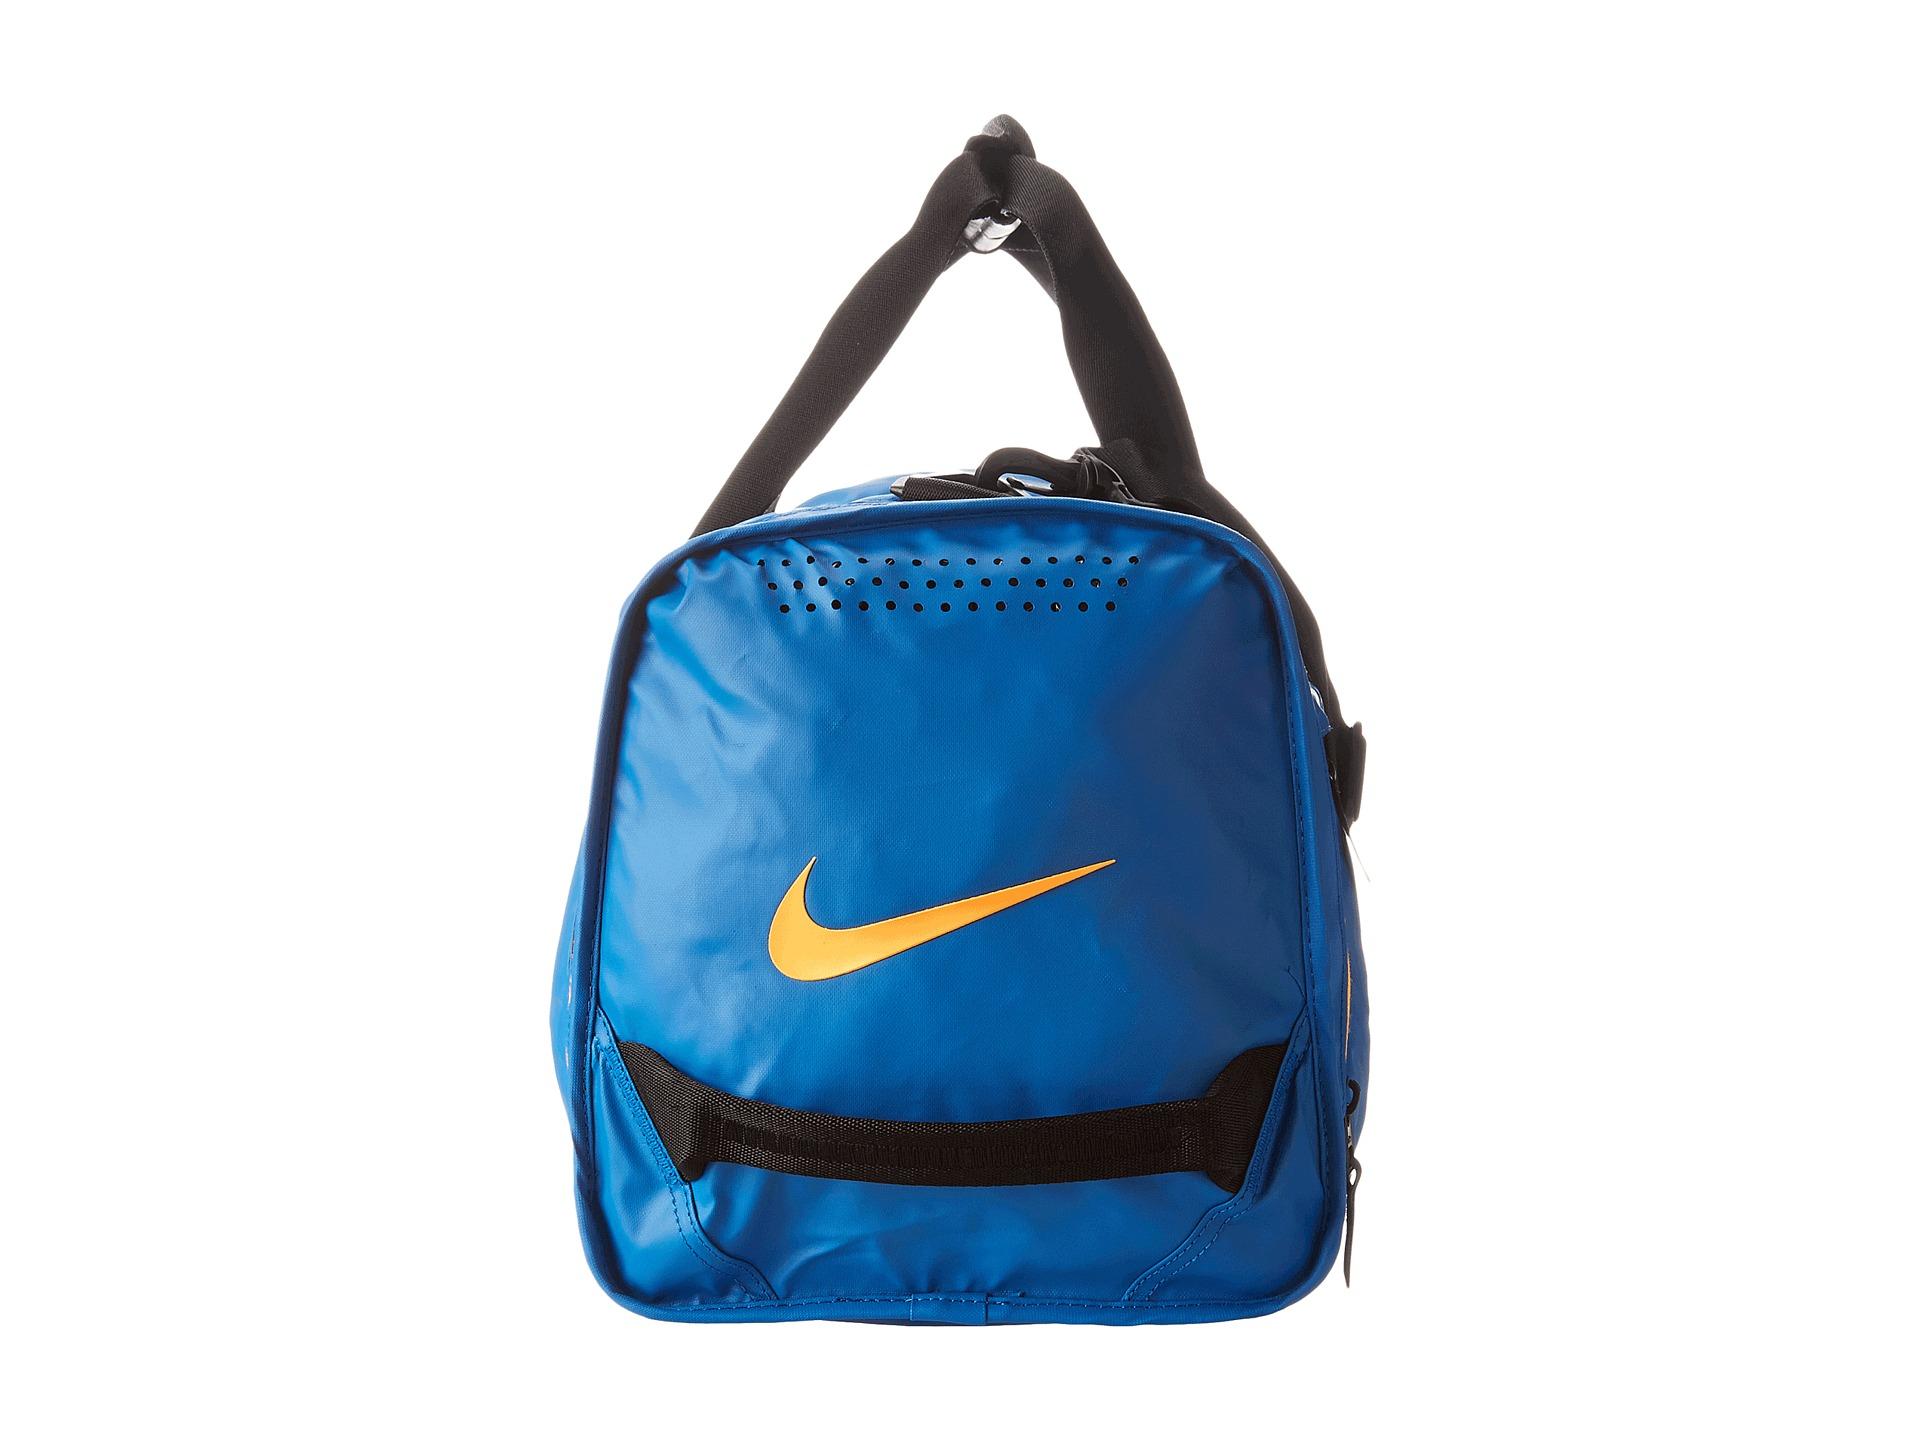 cffecd4d7f ... Lyst - Nike Ultimatum Max Air Small Duffel in Blue ...